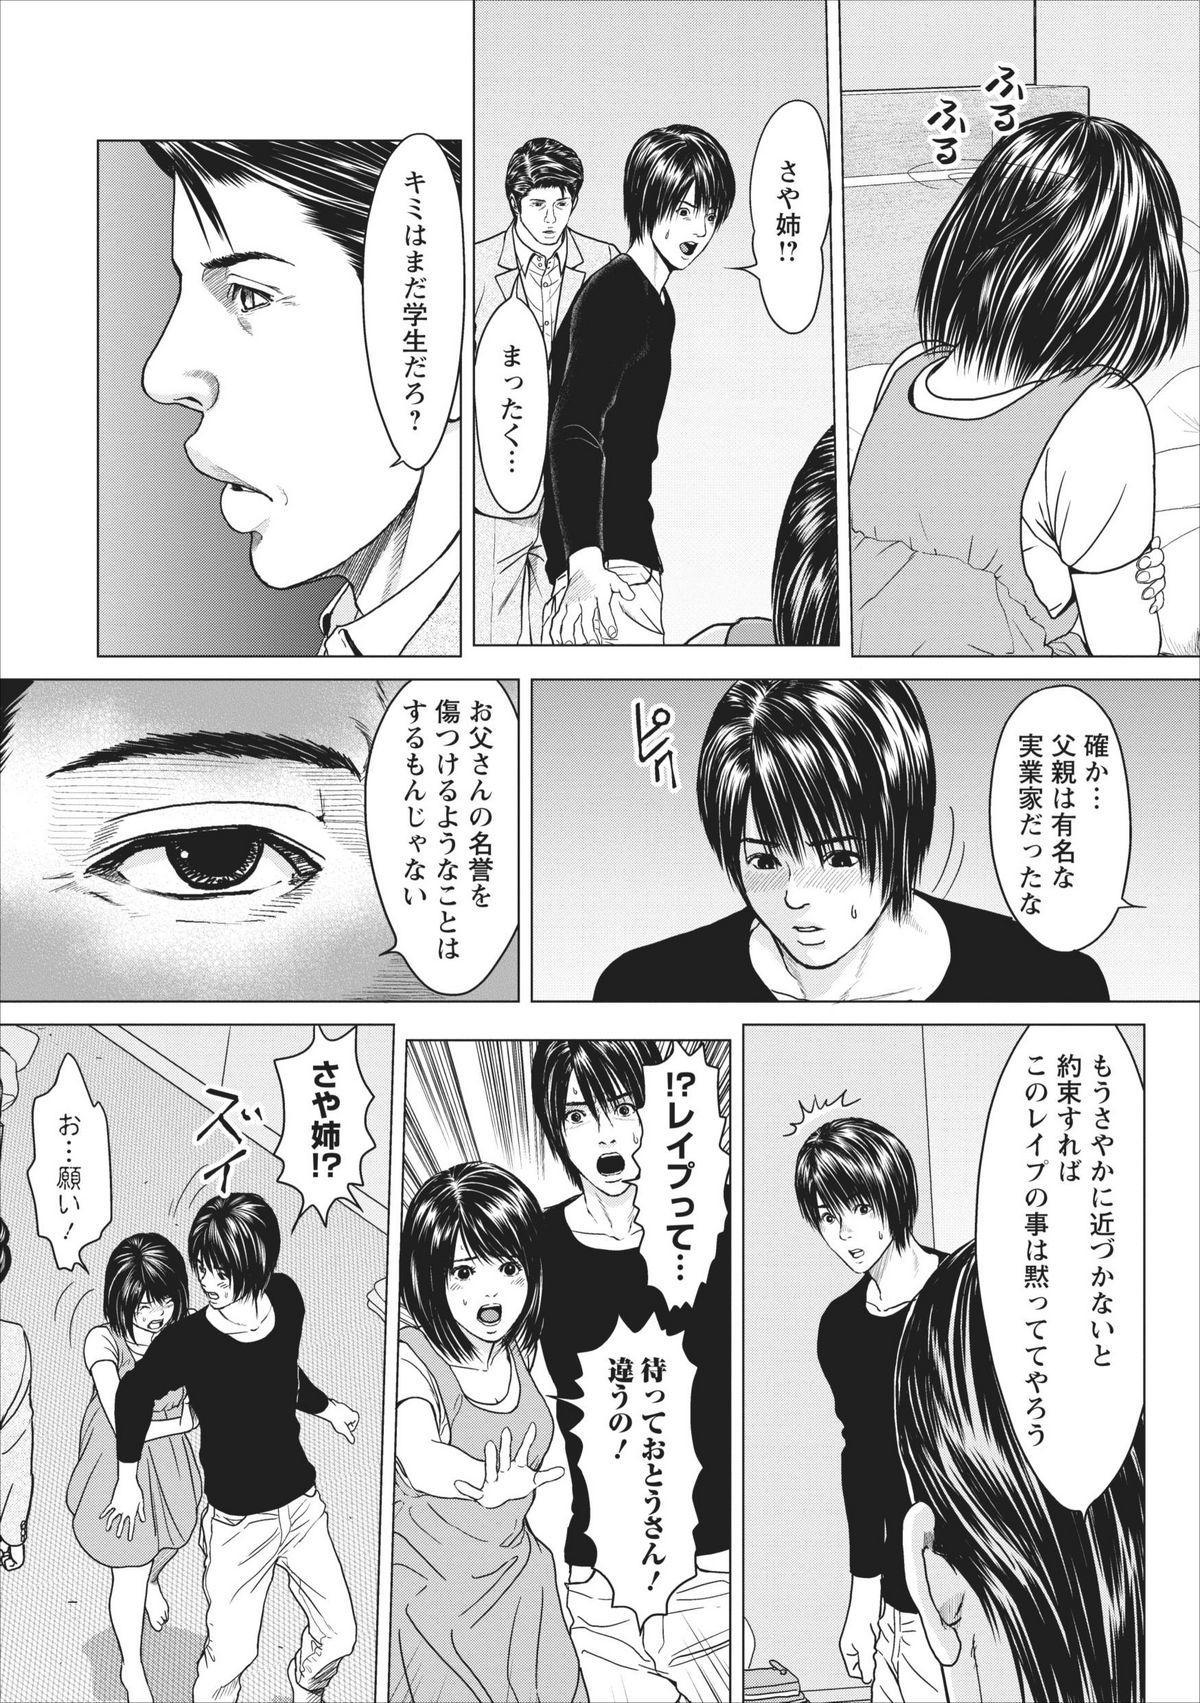 Sex Izonshou ch.9 11